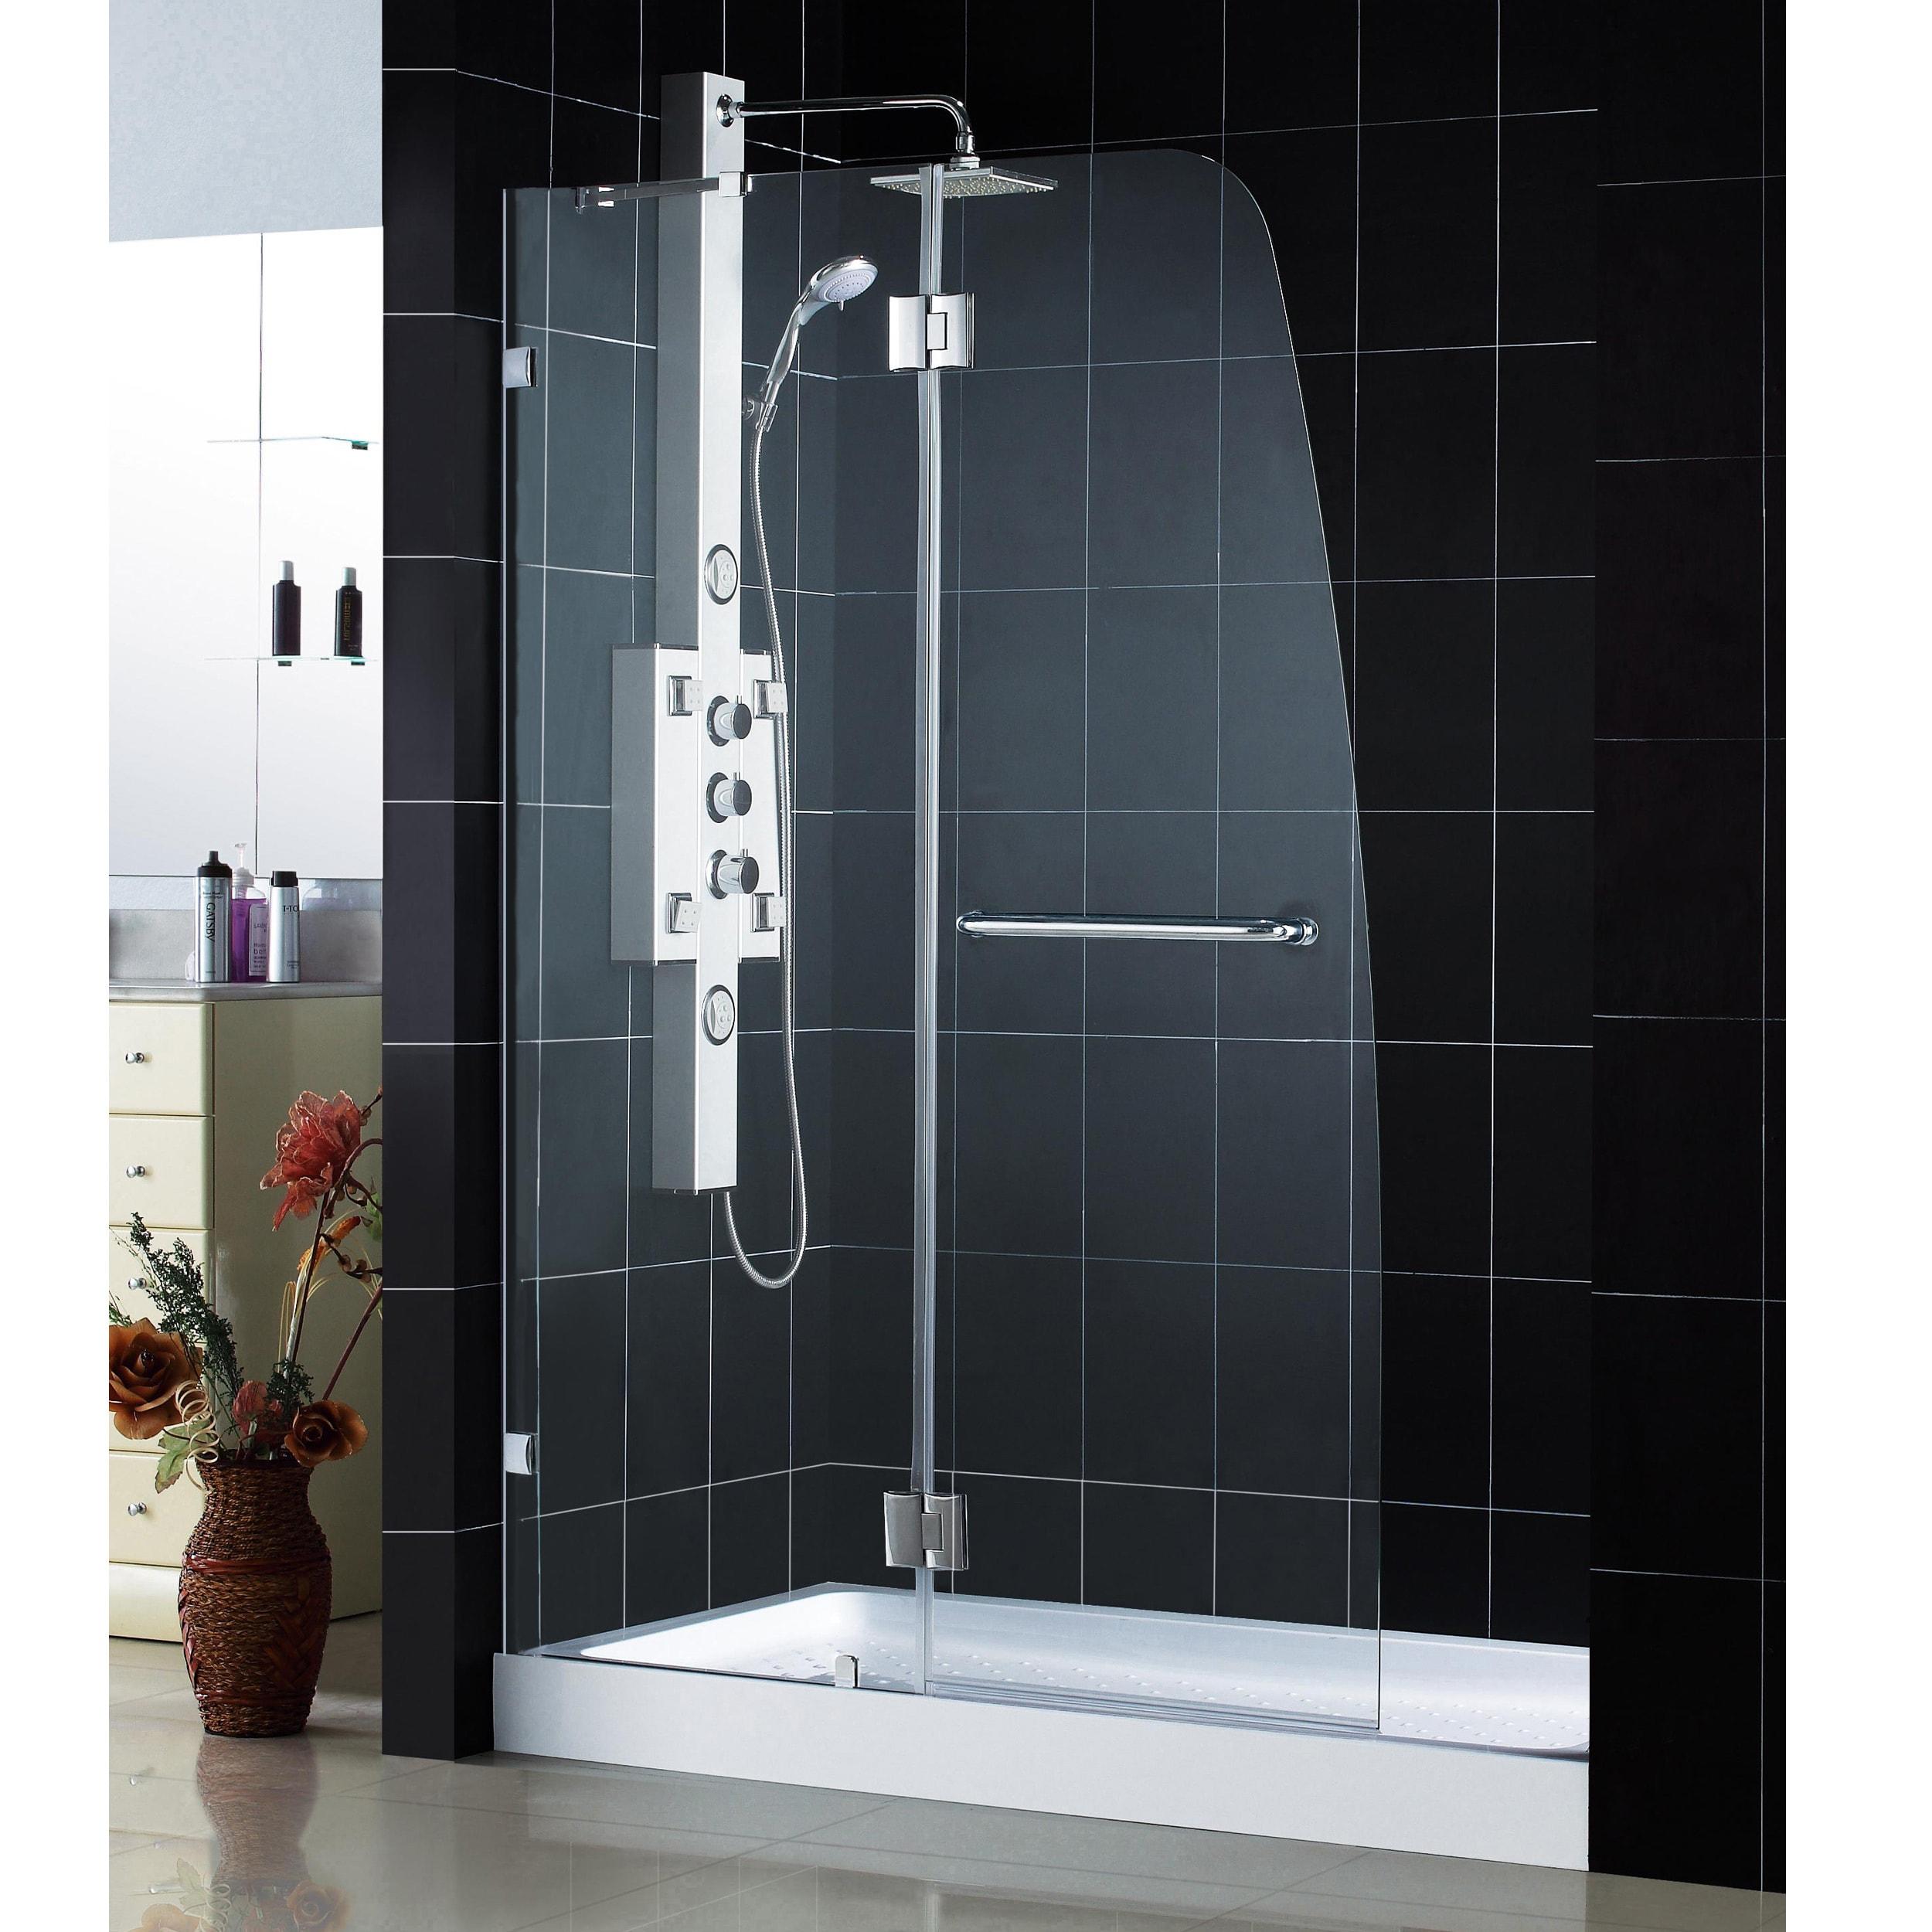 DreamLine 45 x 72 Aqua Lux Glass Shower Door with 36 x 48 Shower Base